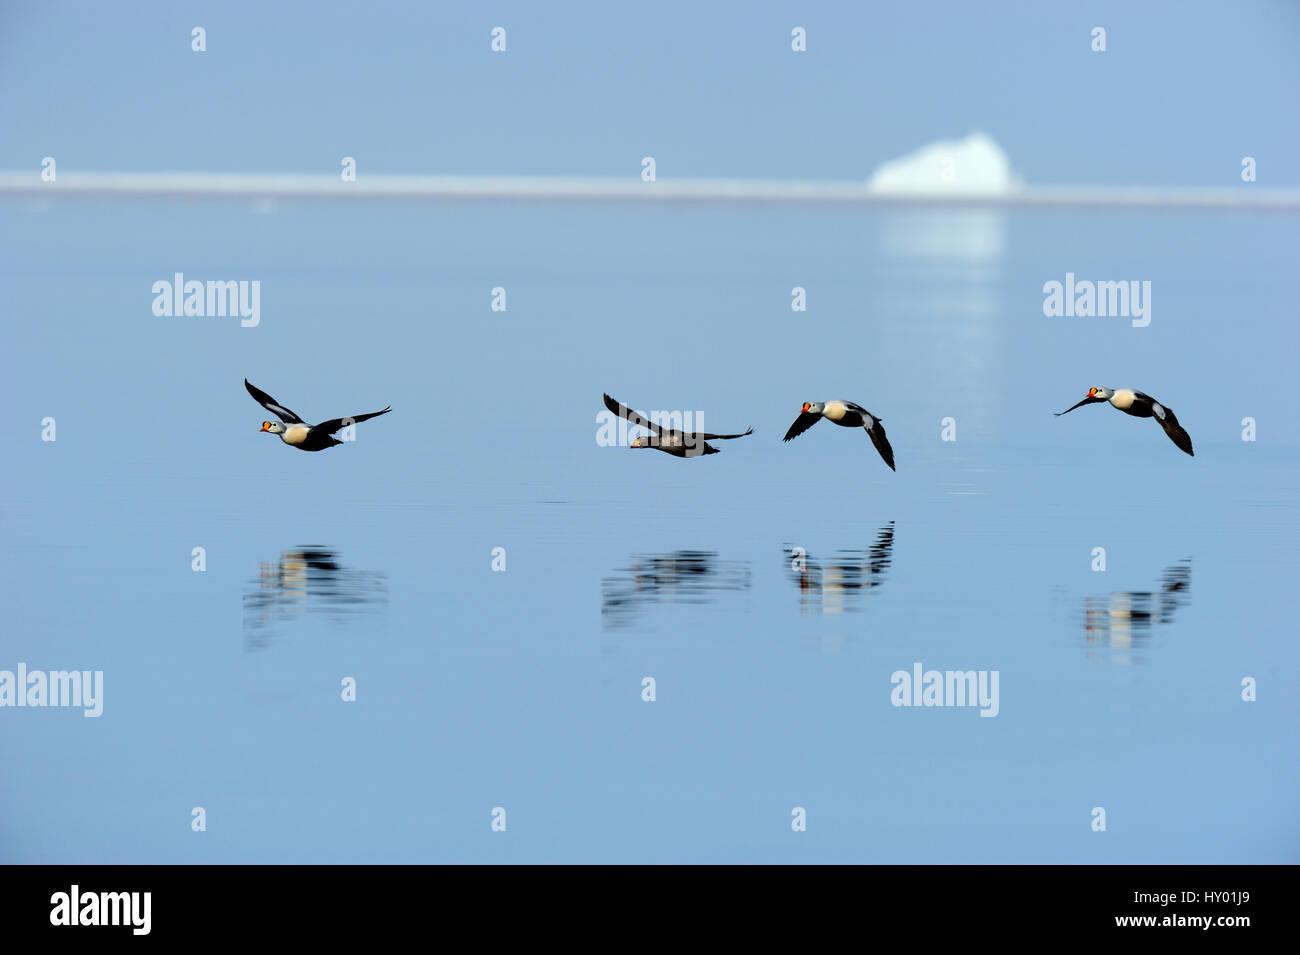 King eider duck  (Somateria spectabilis)  flying over water. Floe edge, Arctic Bay, Nunavut, Canada. - Stock Image